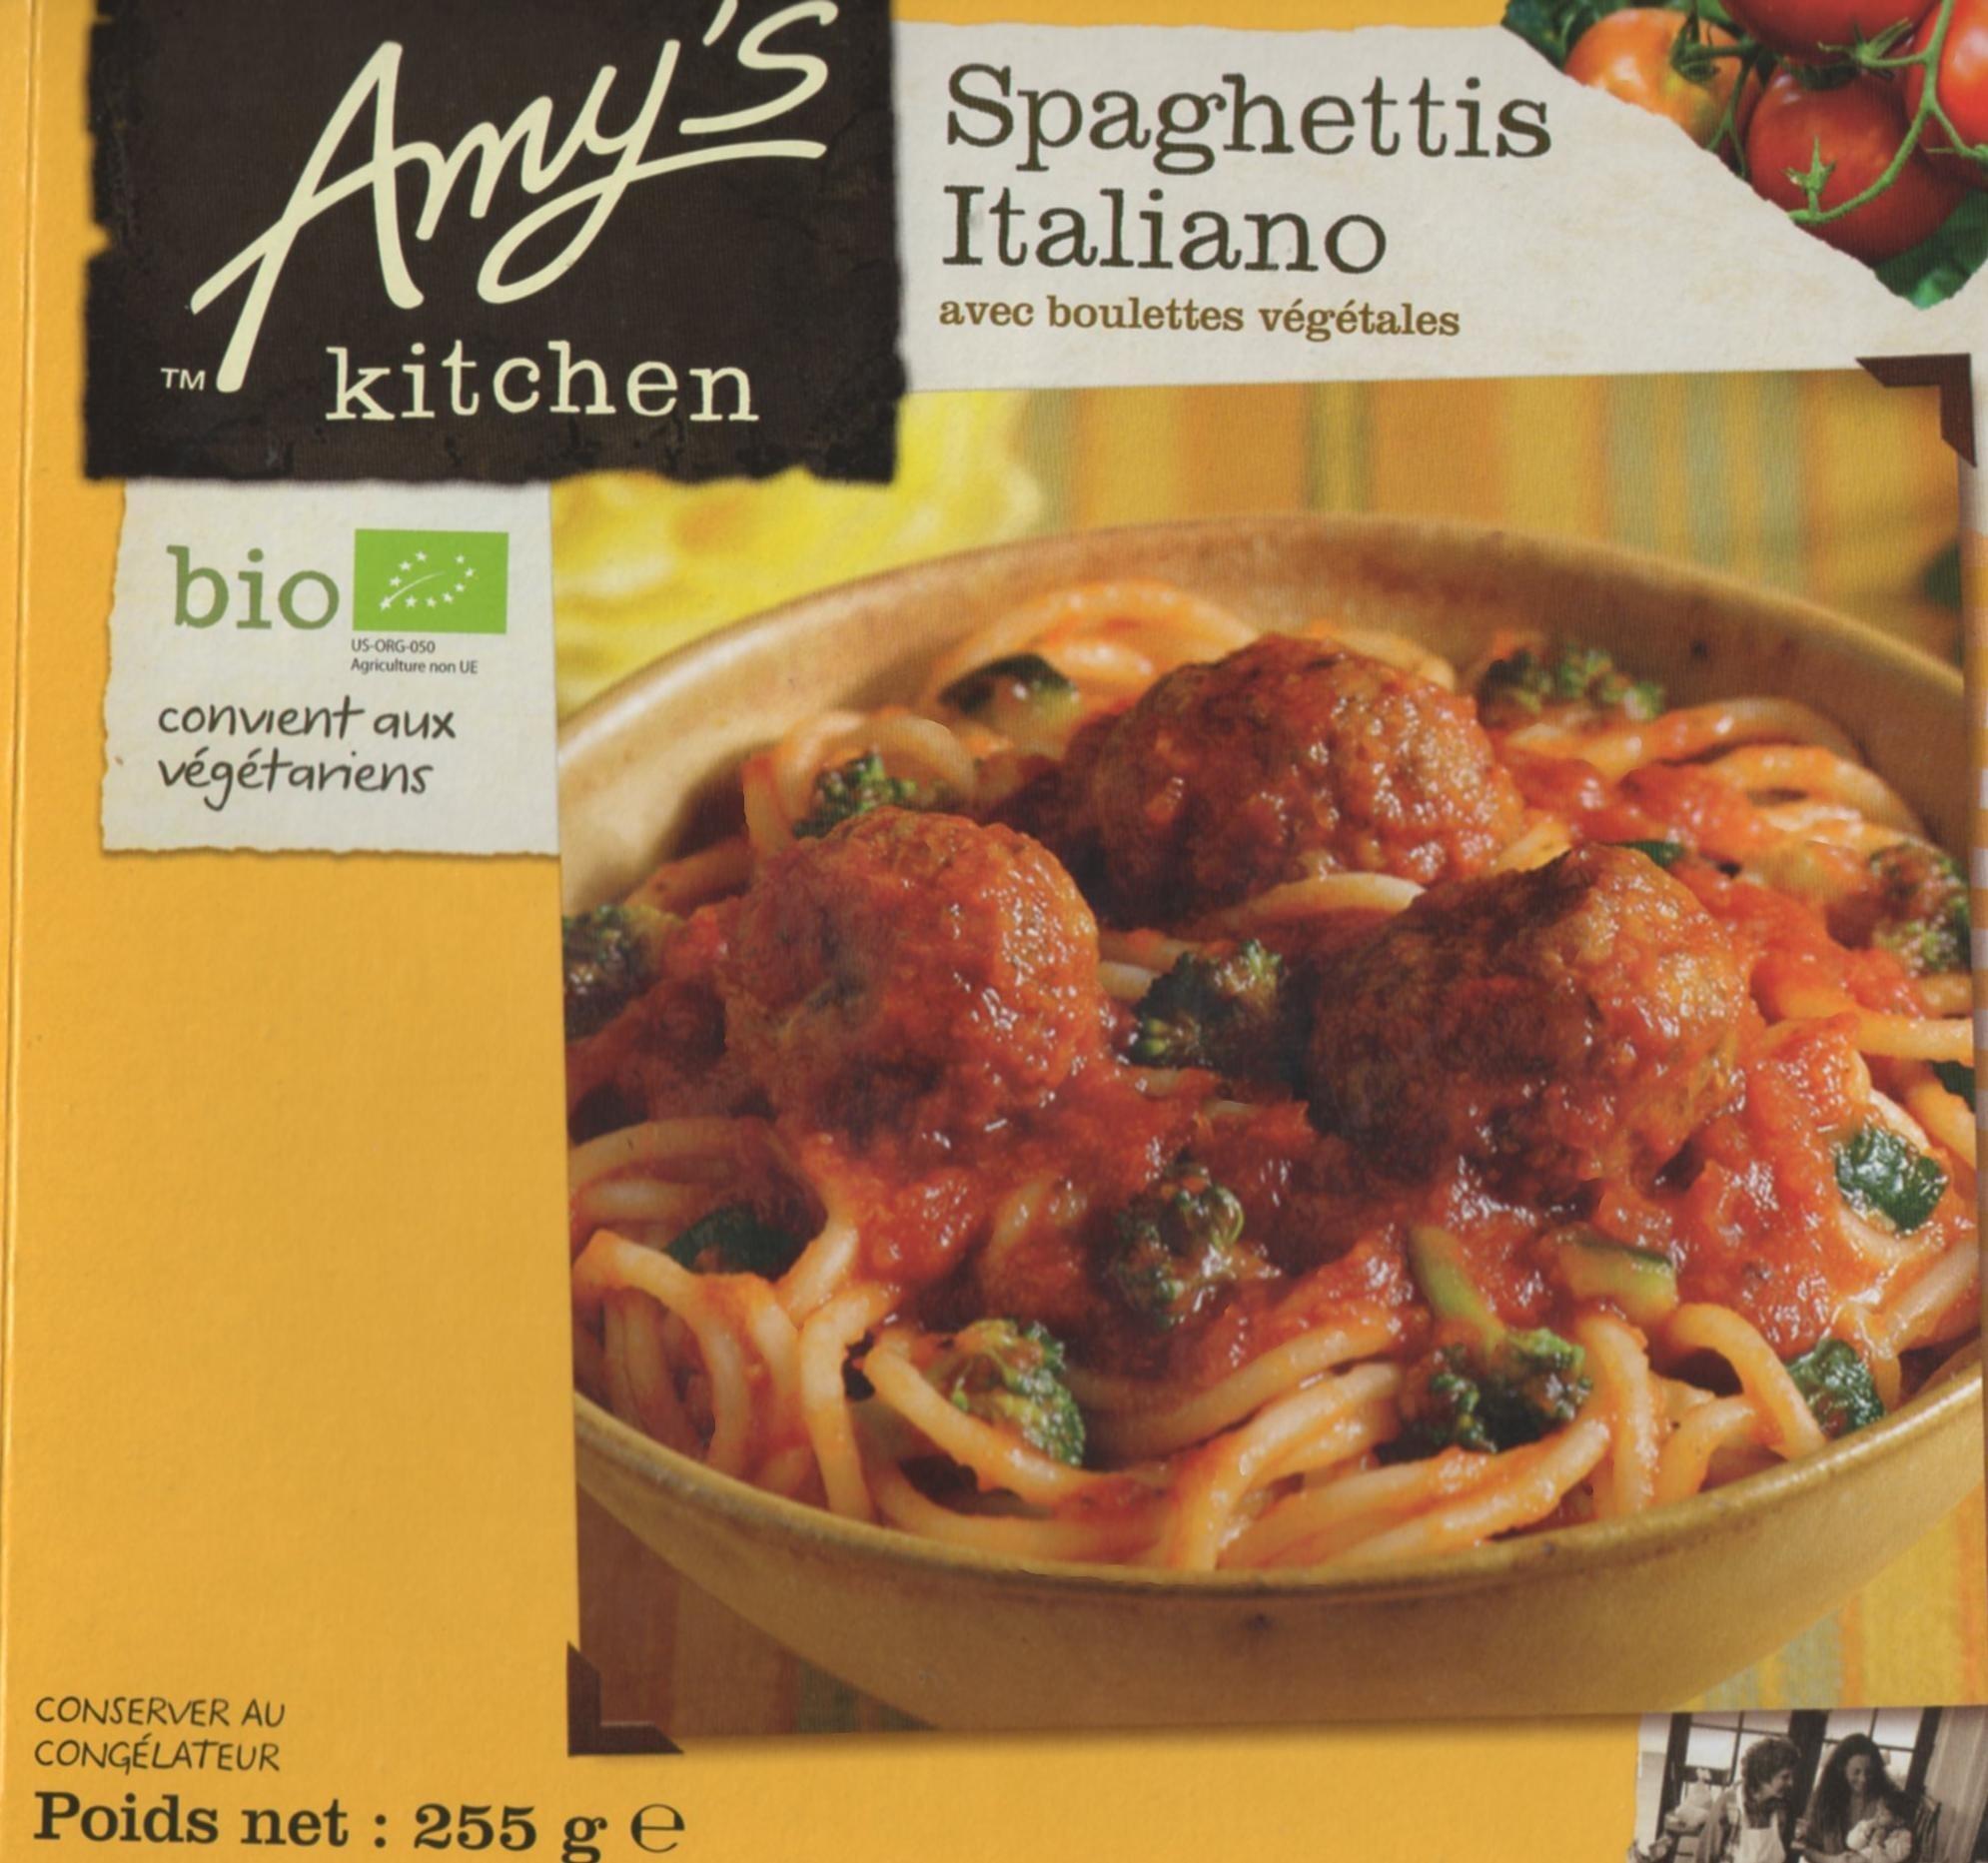 Spaghettis Italiano avec boulettes végétales - Product - fr